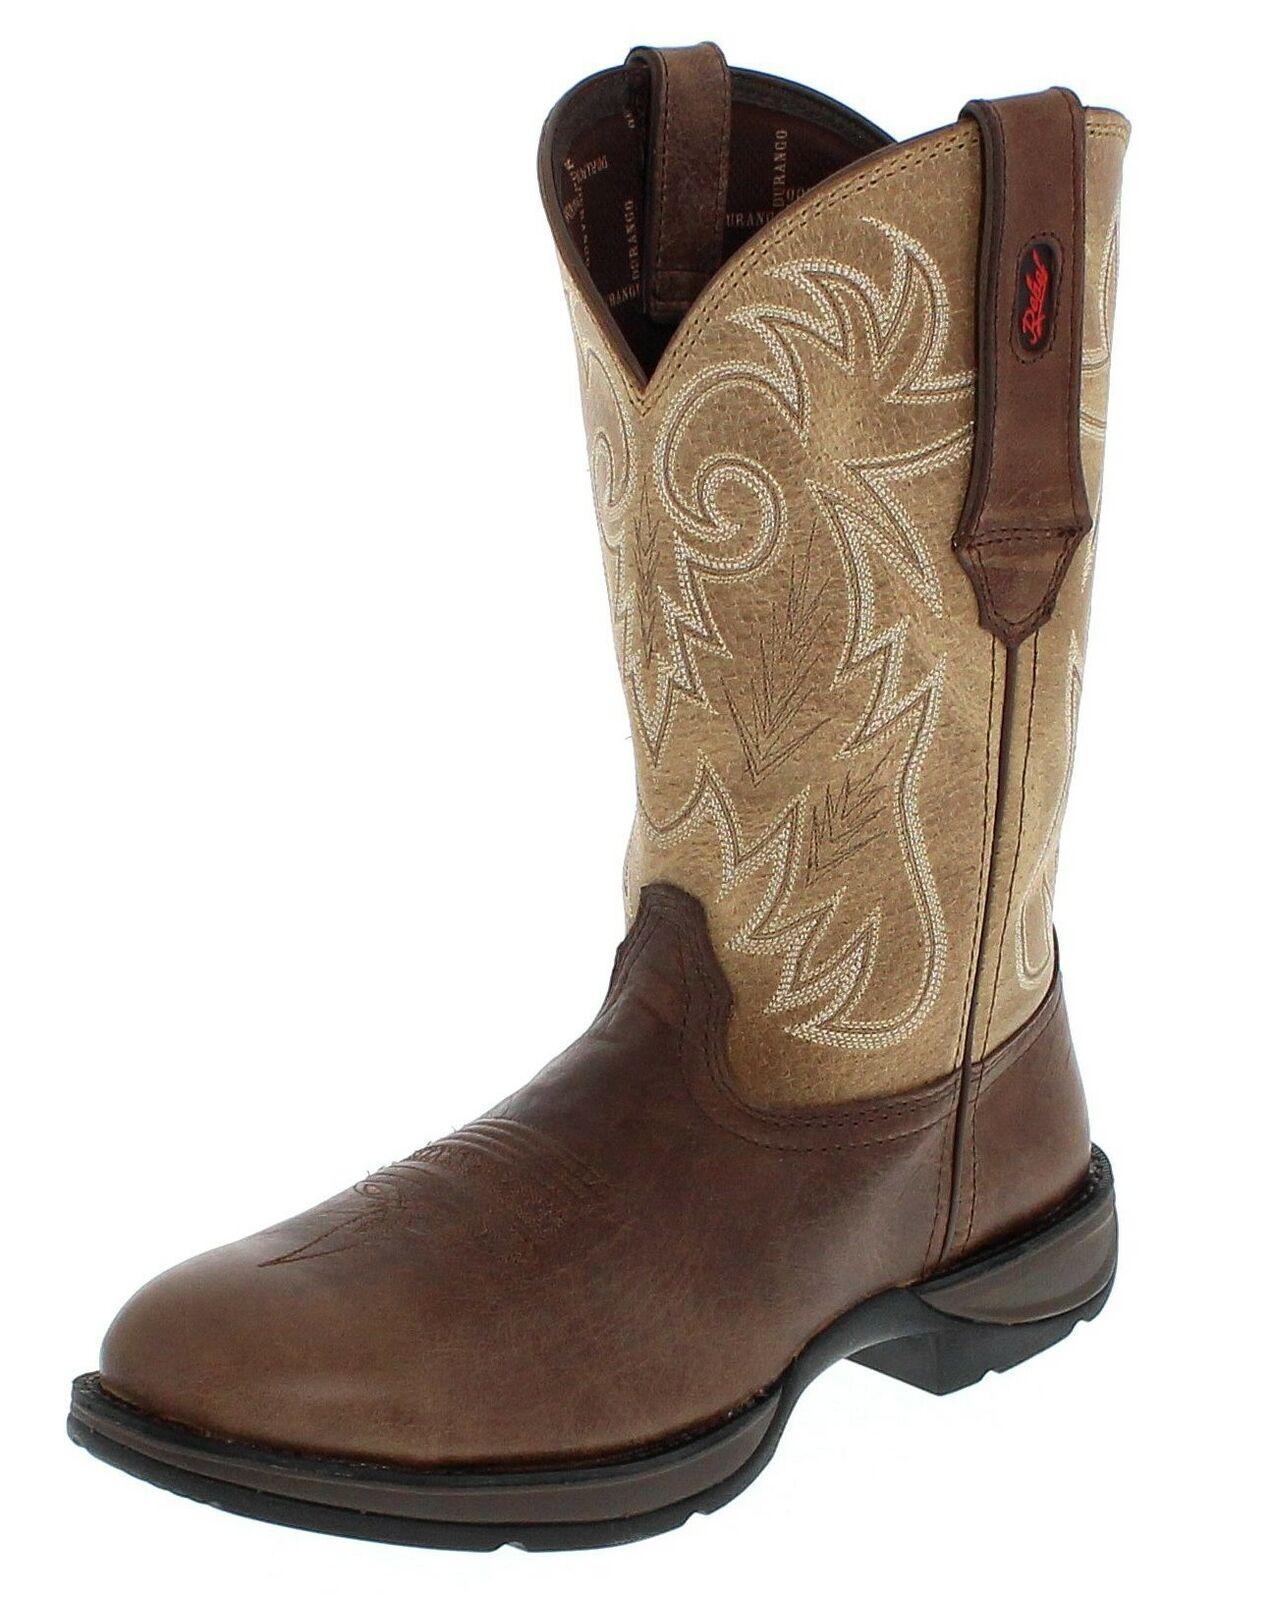 Durango botas botas pull-on dwdb 018 westernreitbotas con tapa de acero